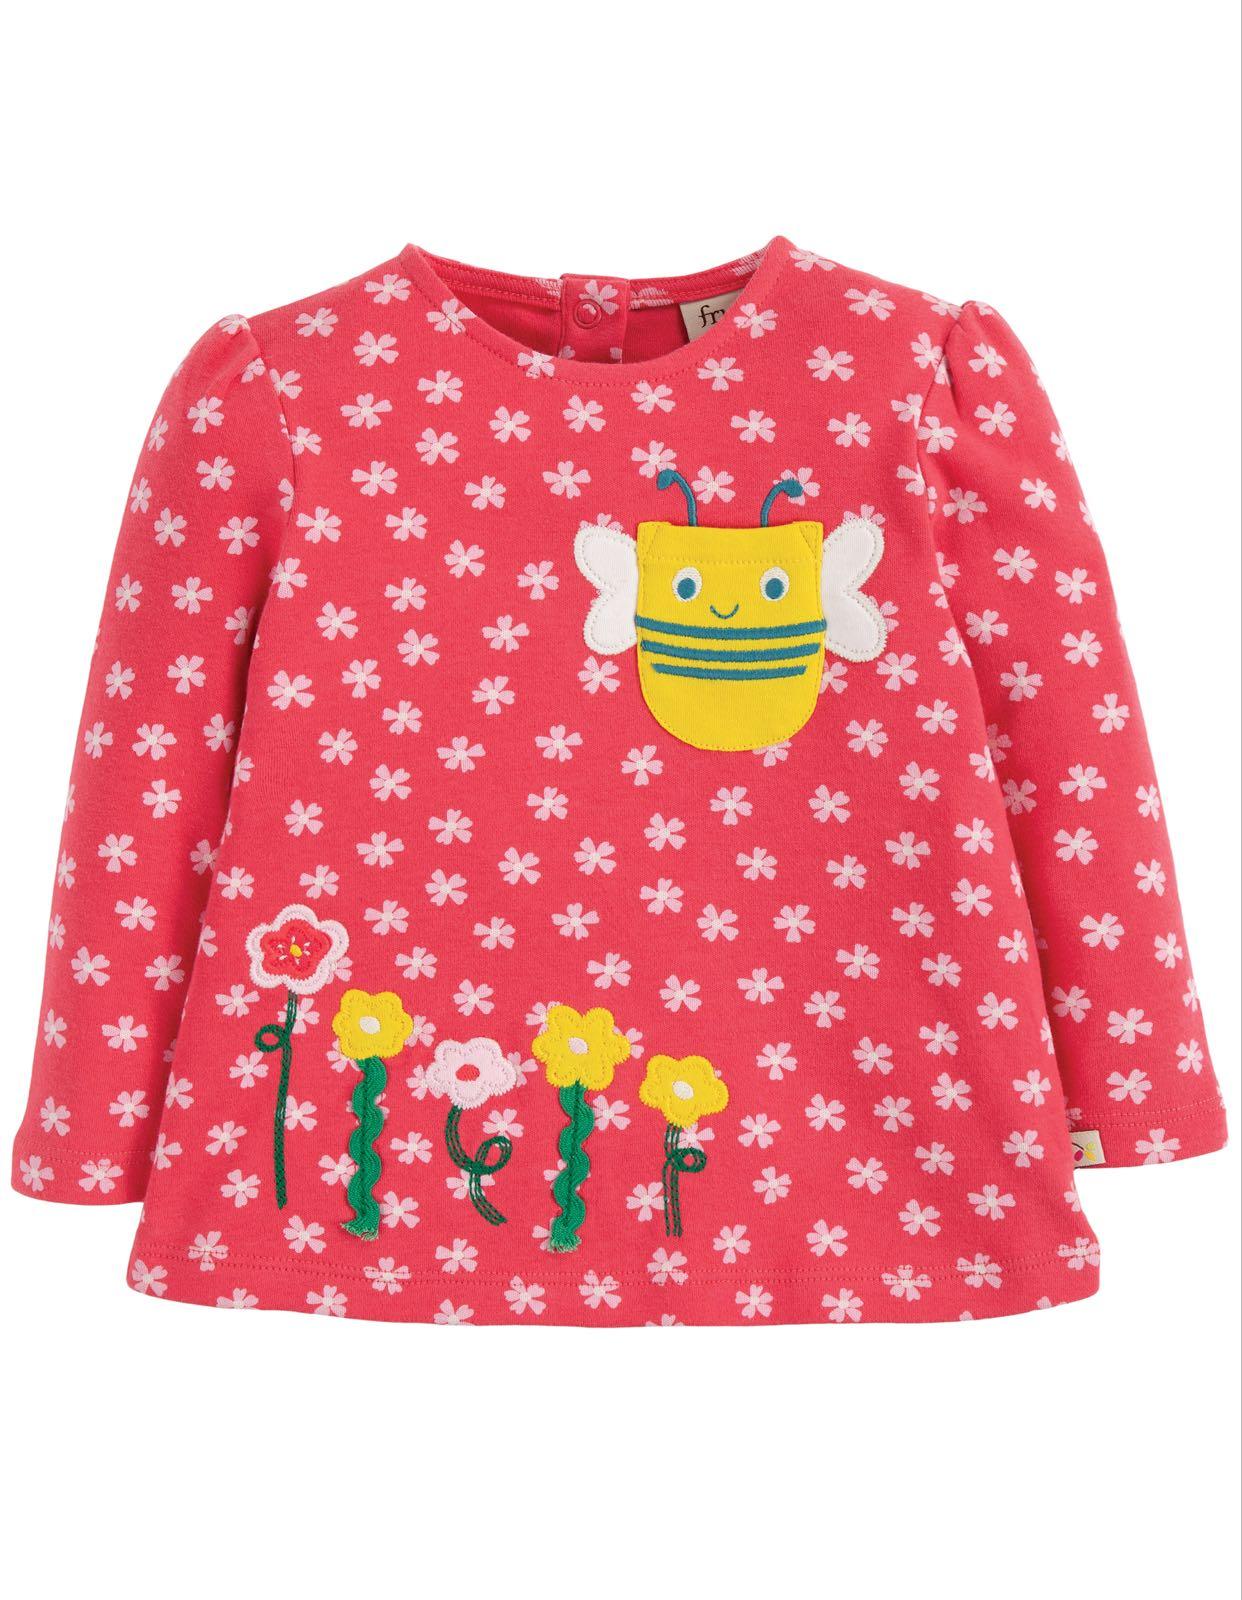 Frugi Connie Appliqué Top, Watermelon Cherry Blossom/Bee